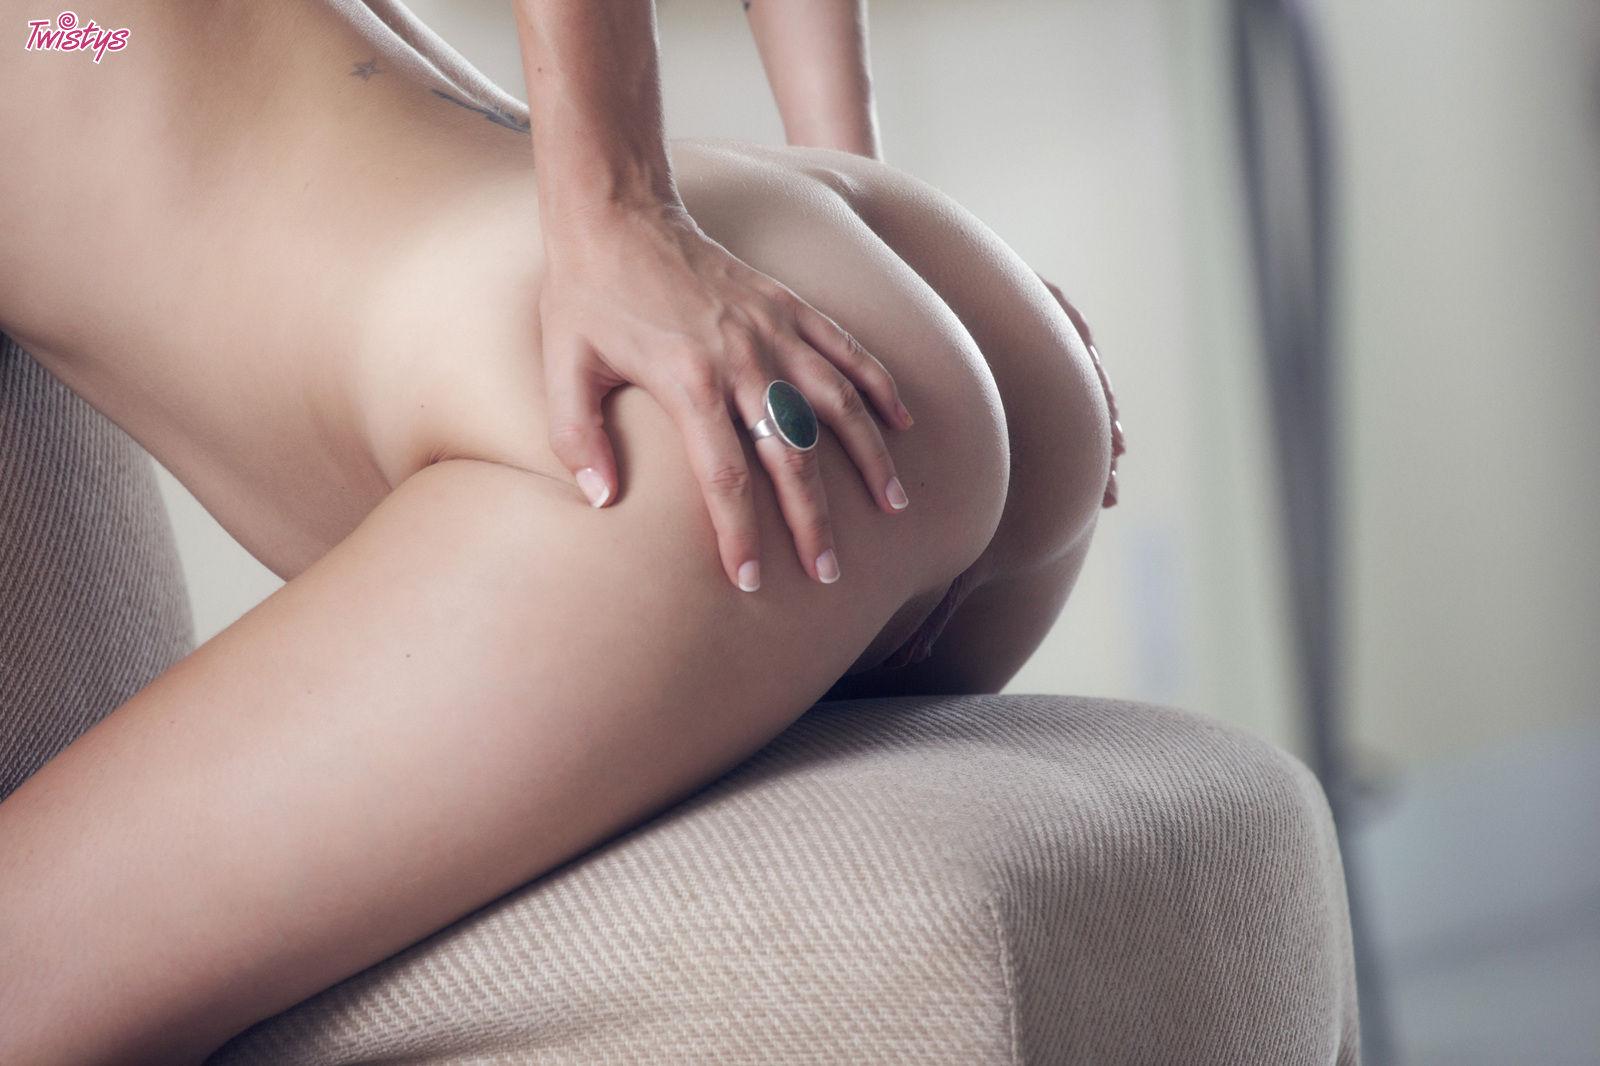 shay-laren-corset-blonde-tits-nude-twistys-15